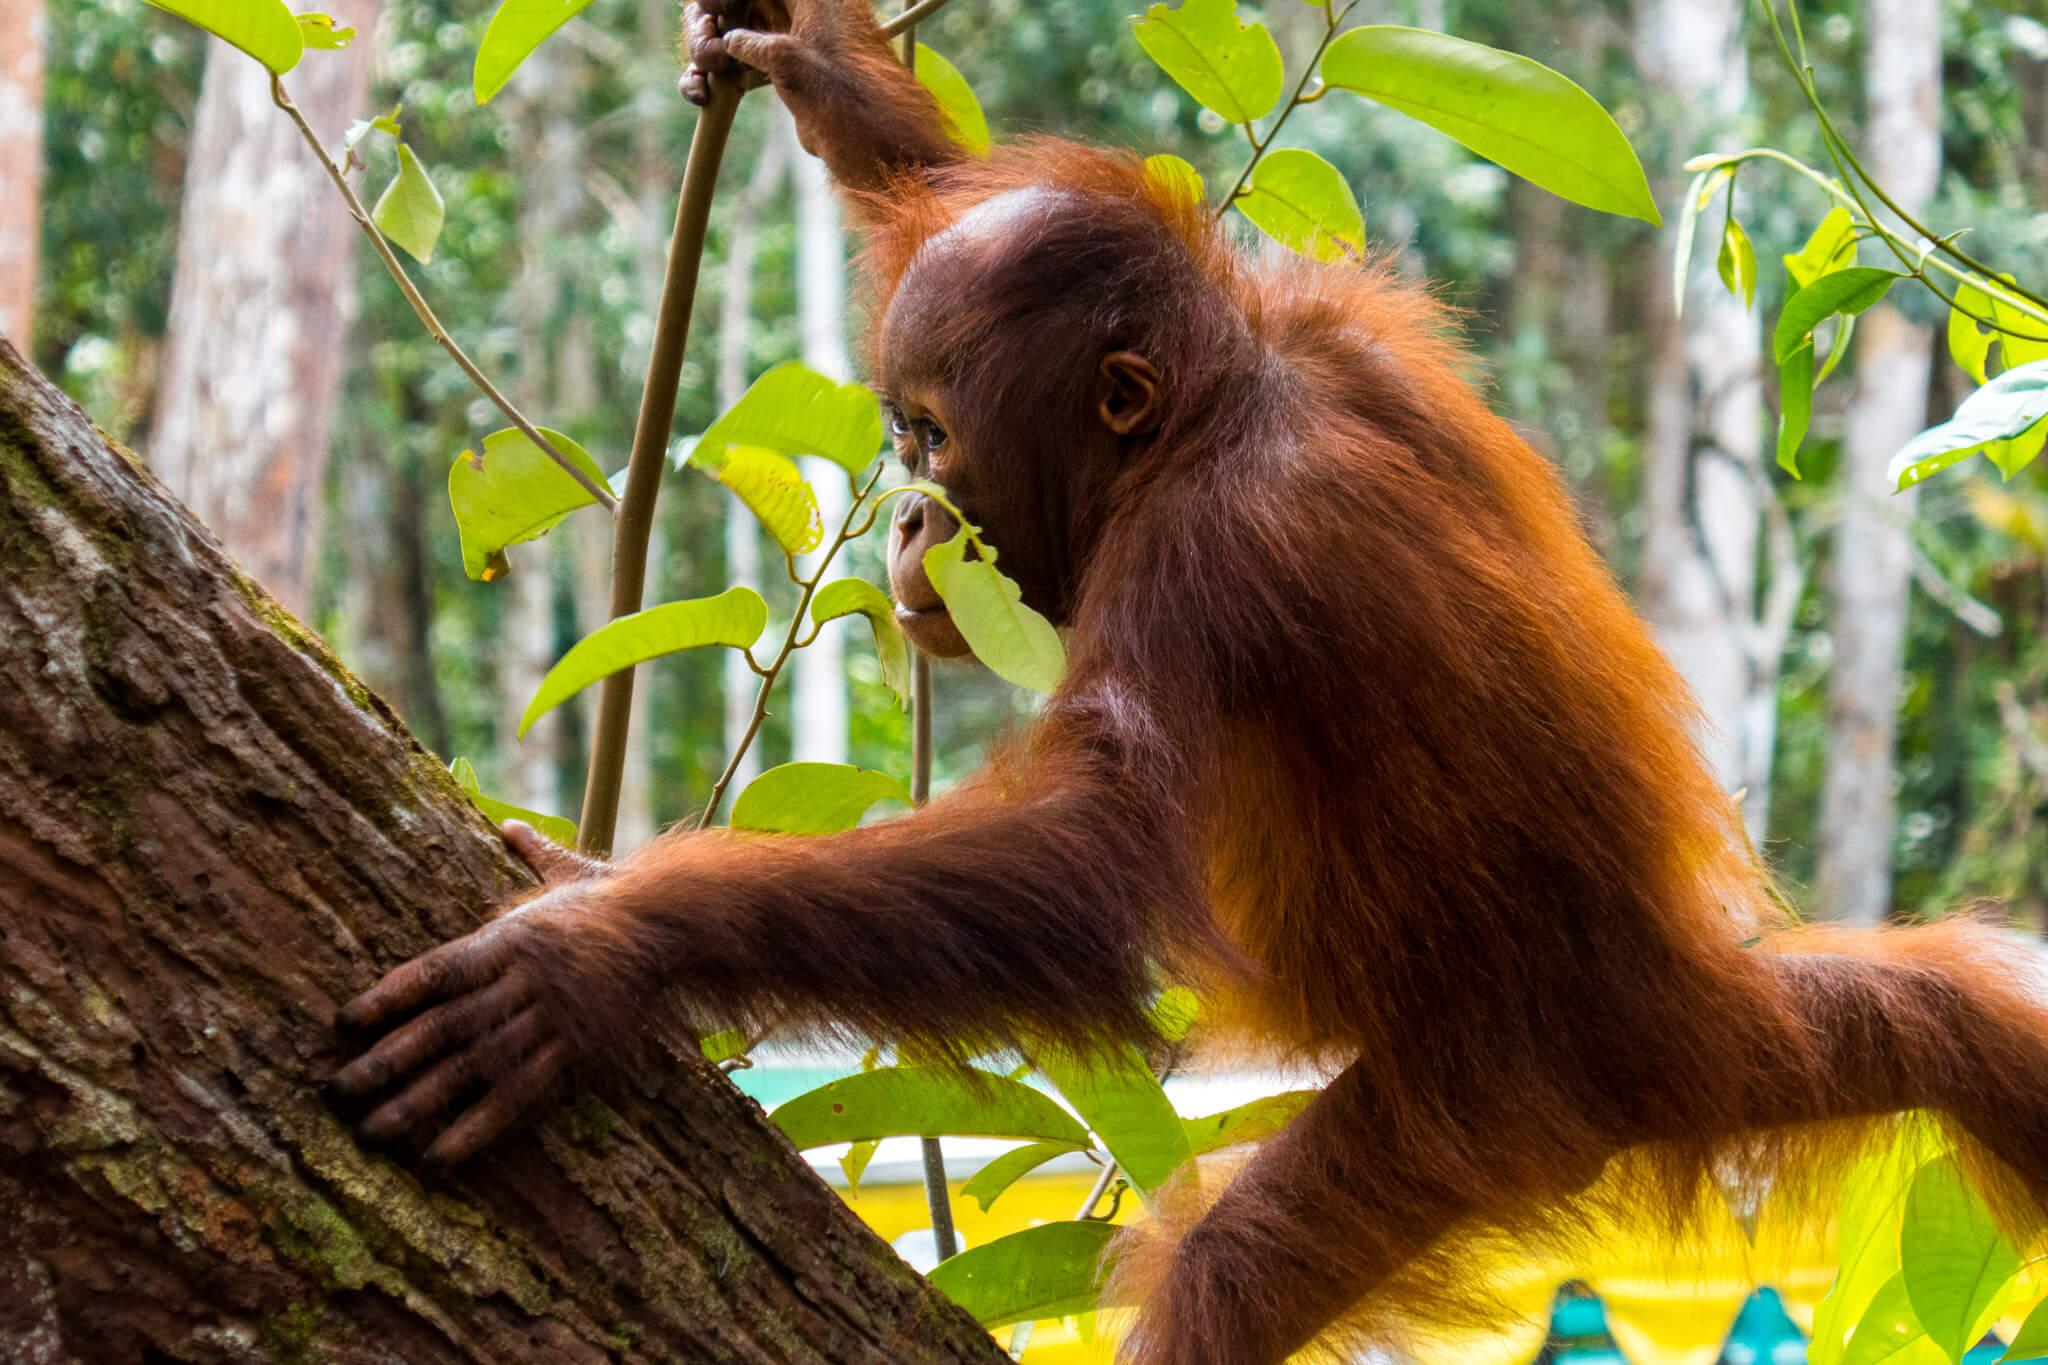 Baby Orangutan in Tanjung Puting, Borneo